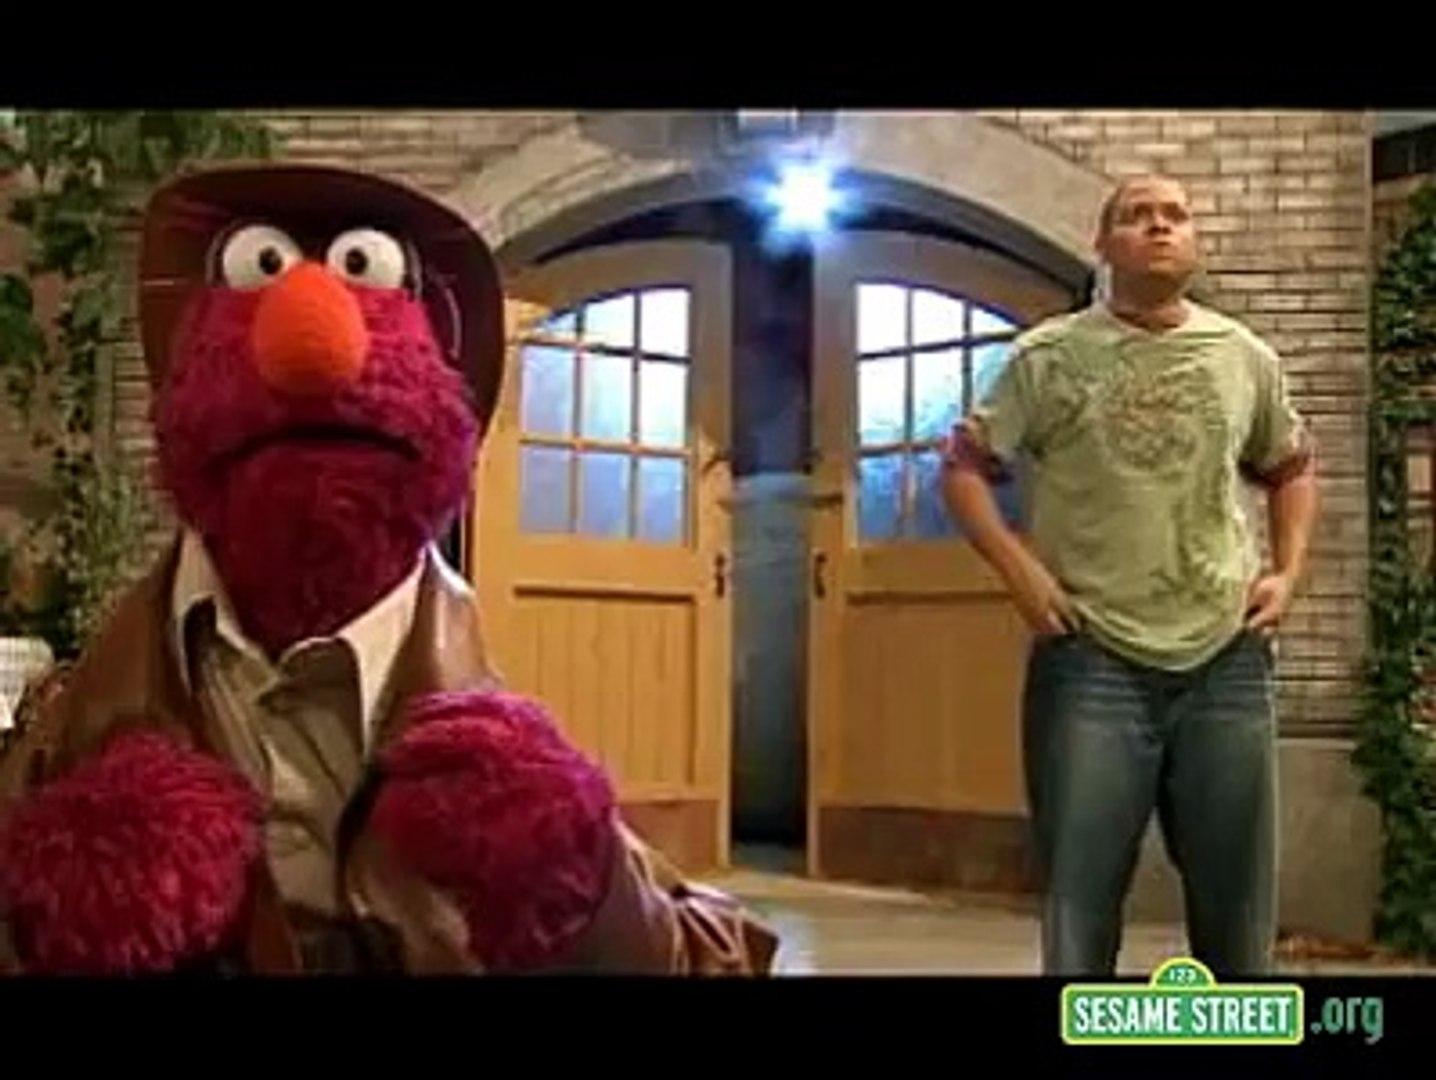 Sesame Street - The Golden Triangle of Destiny